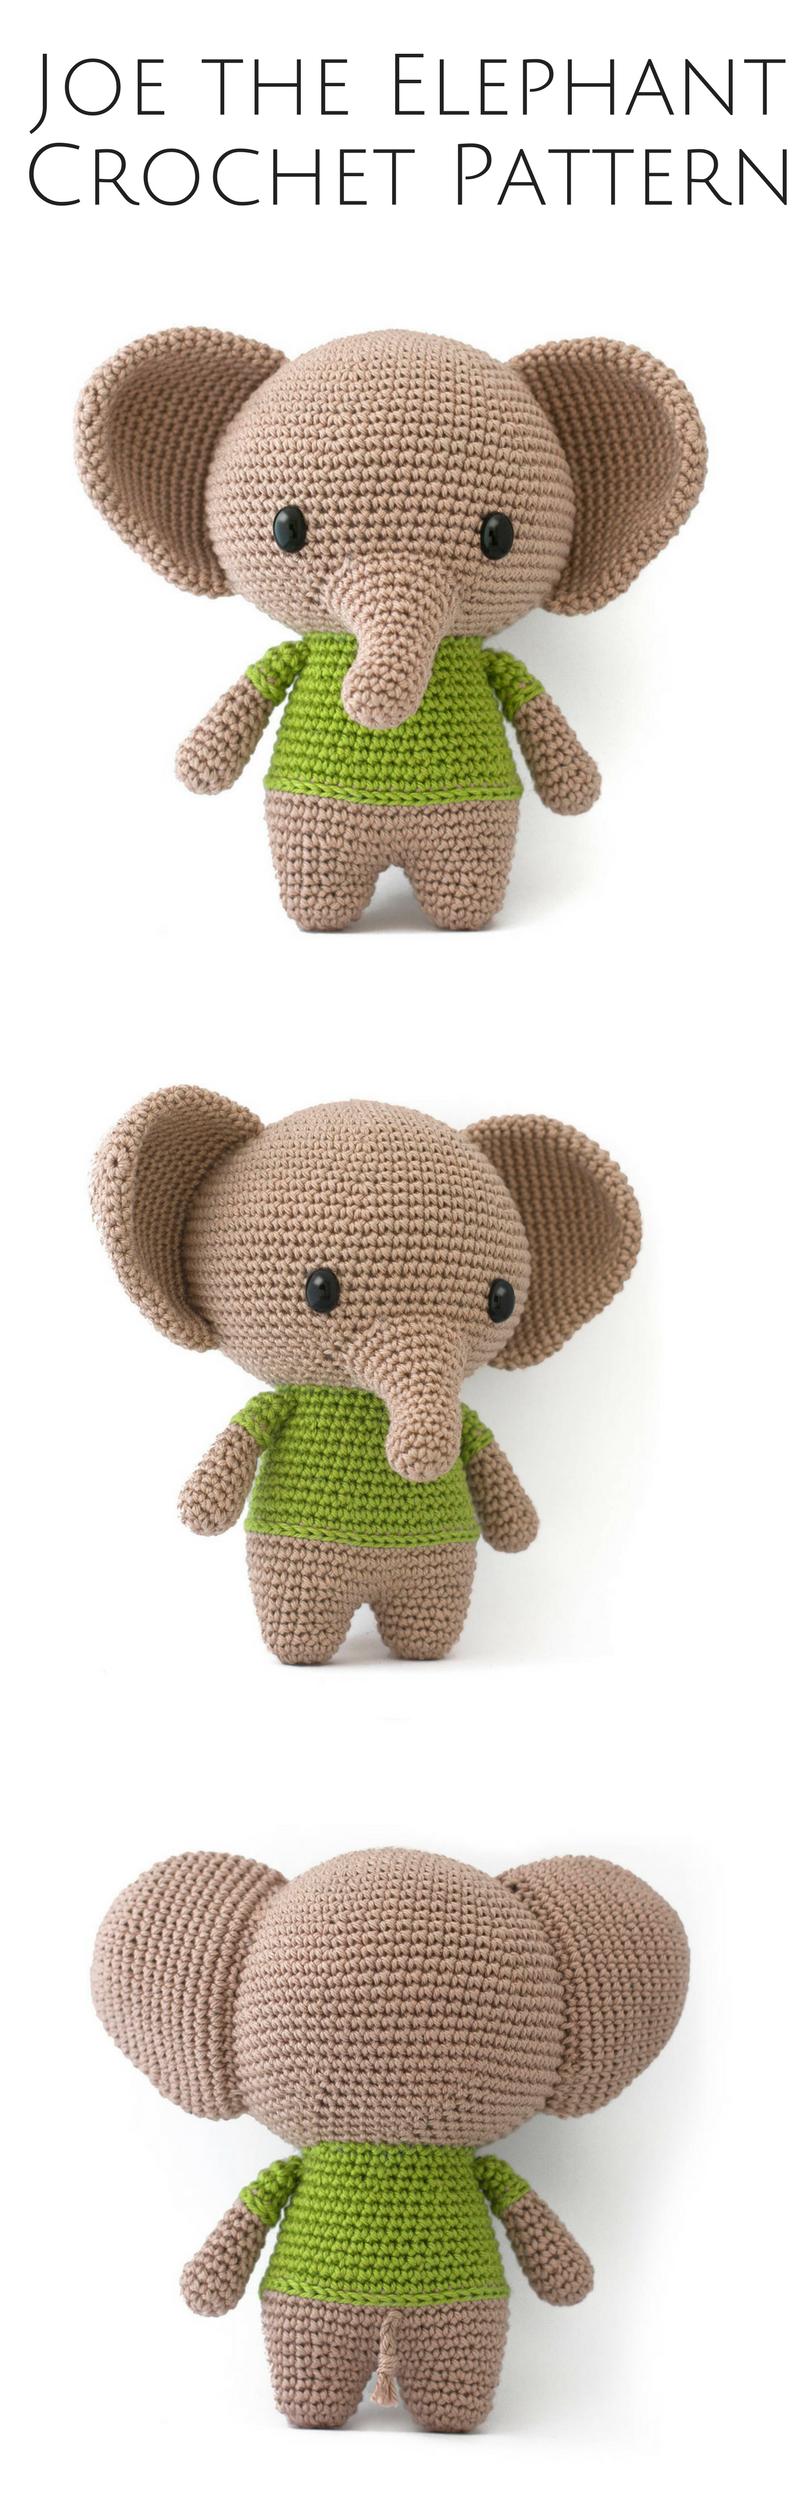 Joe the Elephant amigurumi crochet pattern PDF | Patrones amigurumi ...